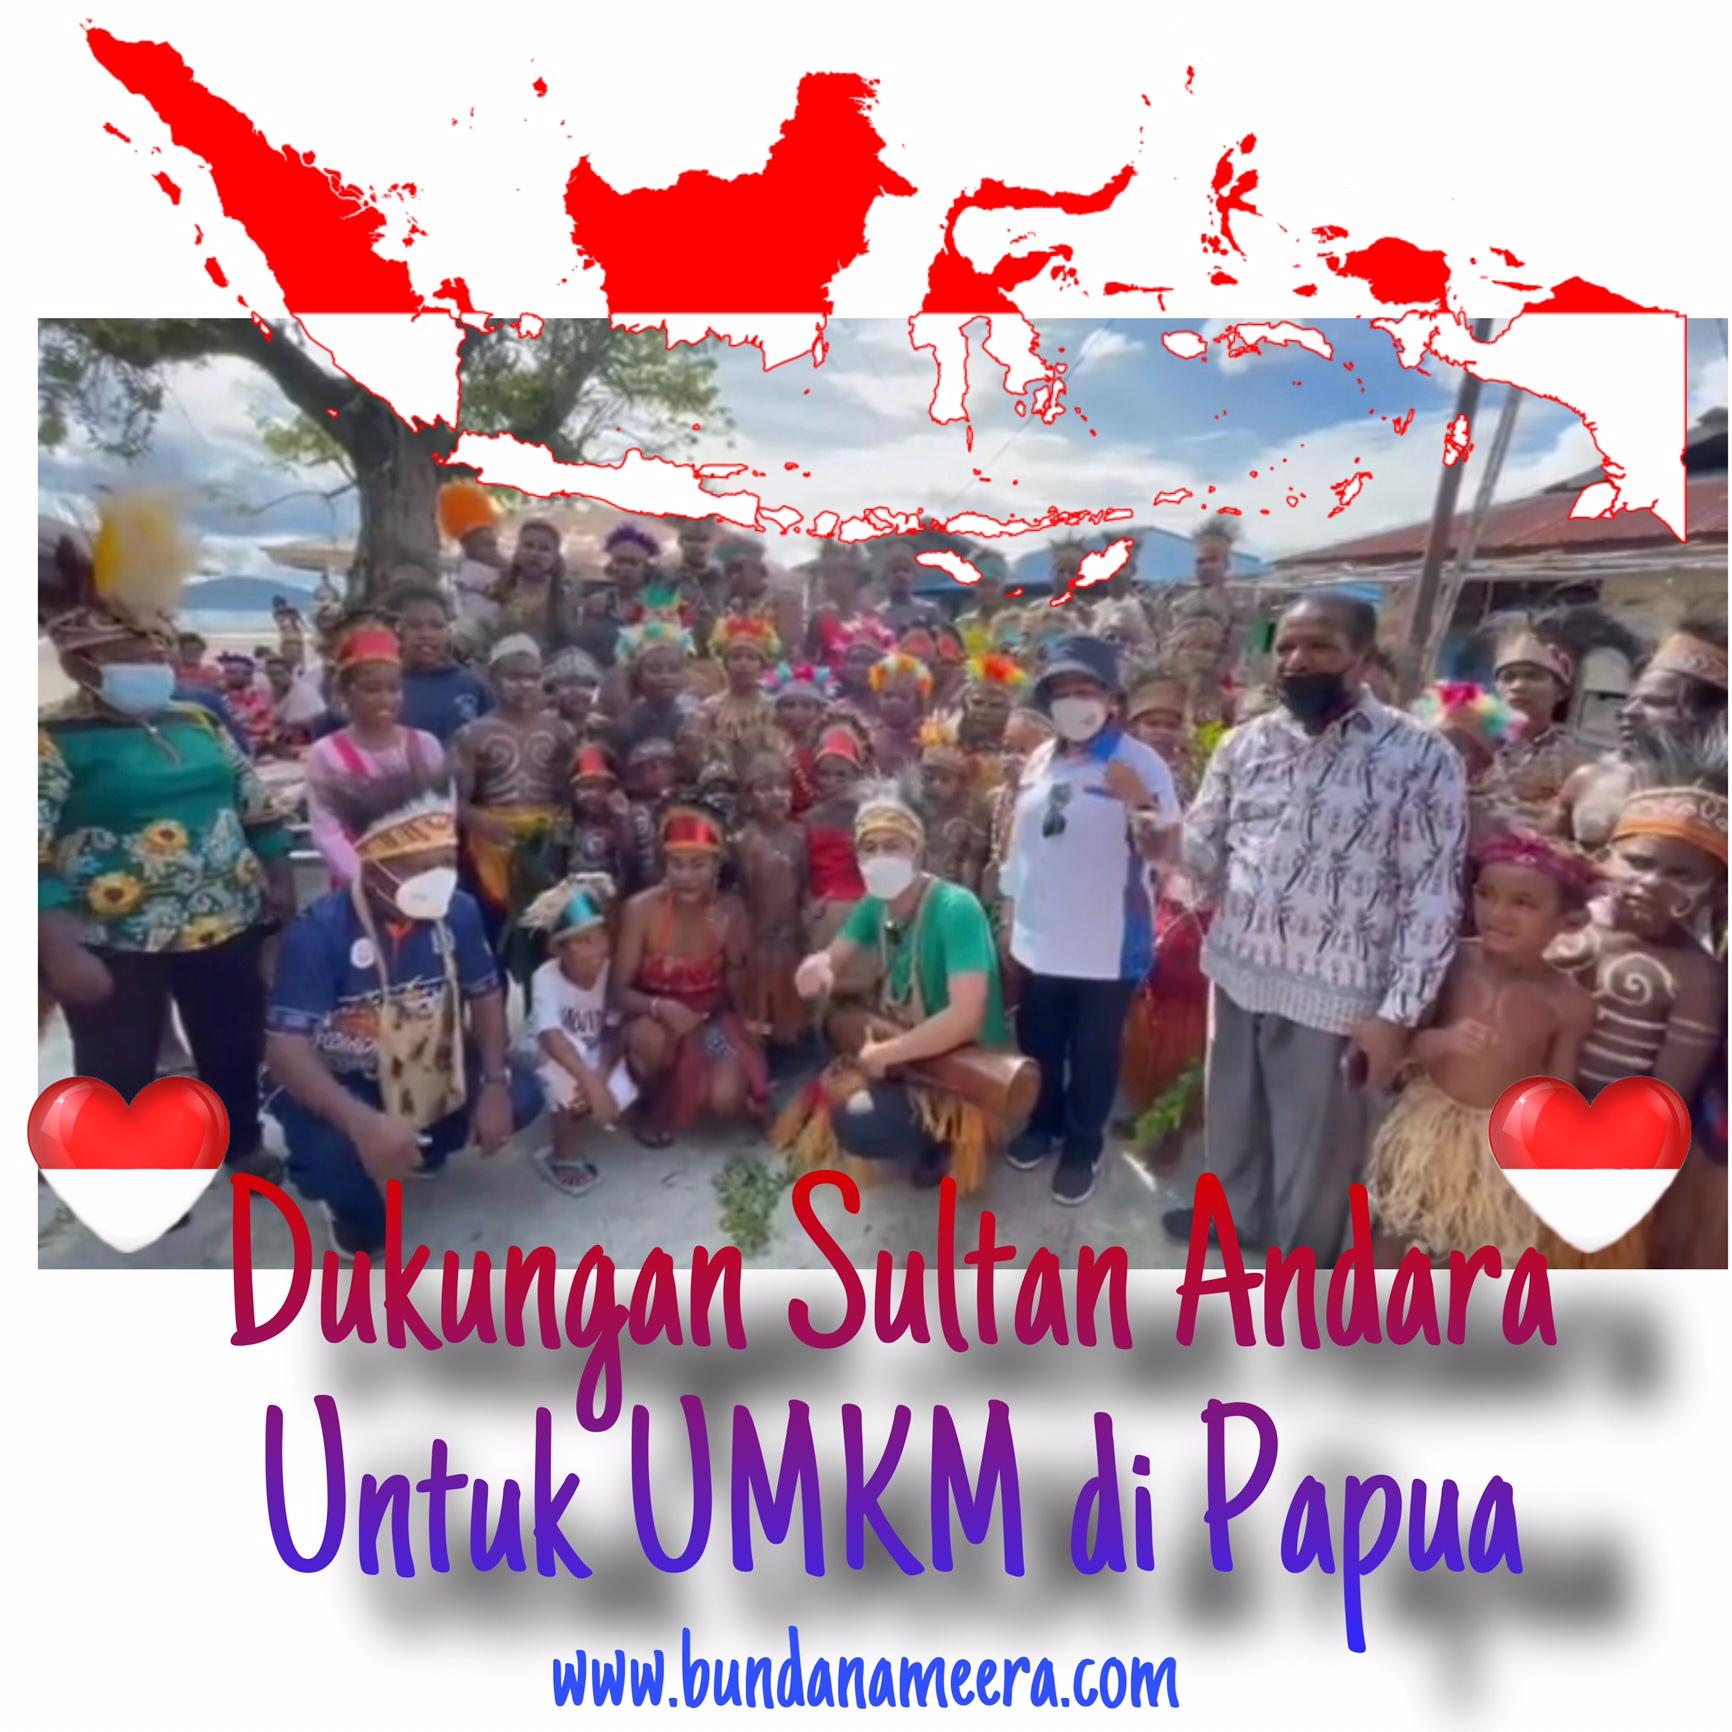 dukungan-raffi-ahmad-untuk-umkm-papua